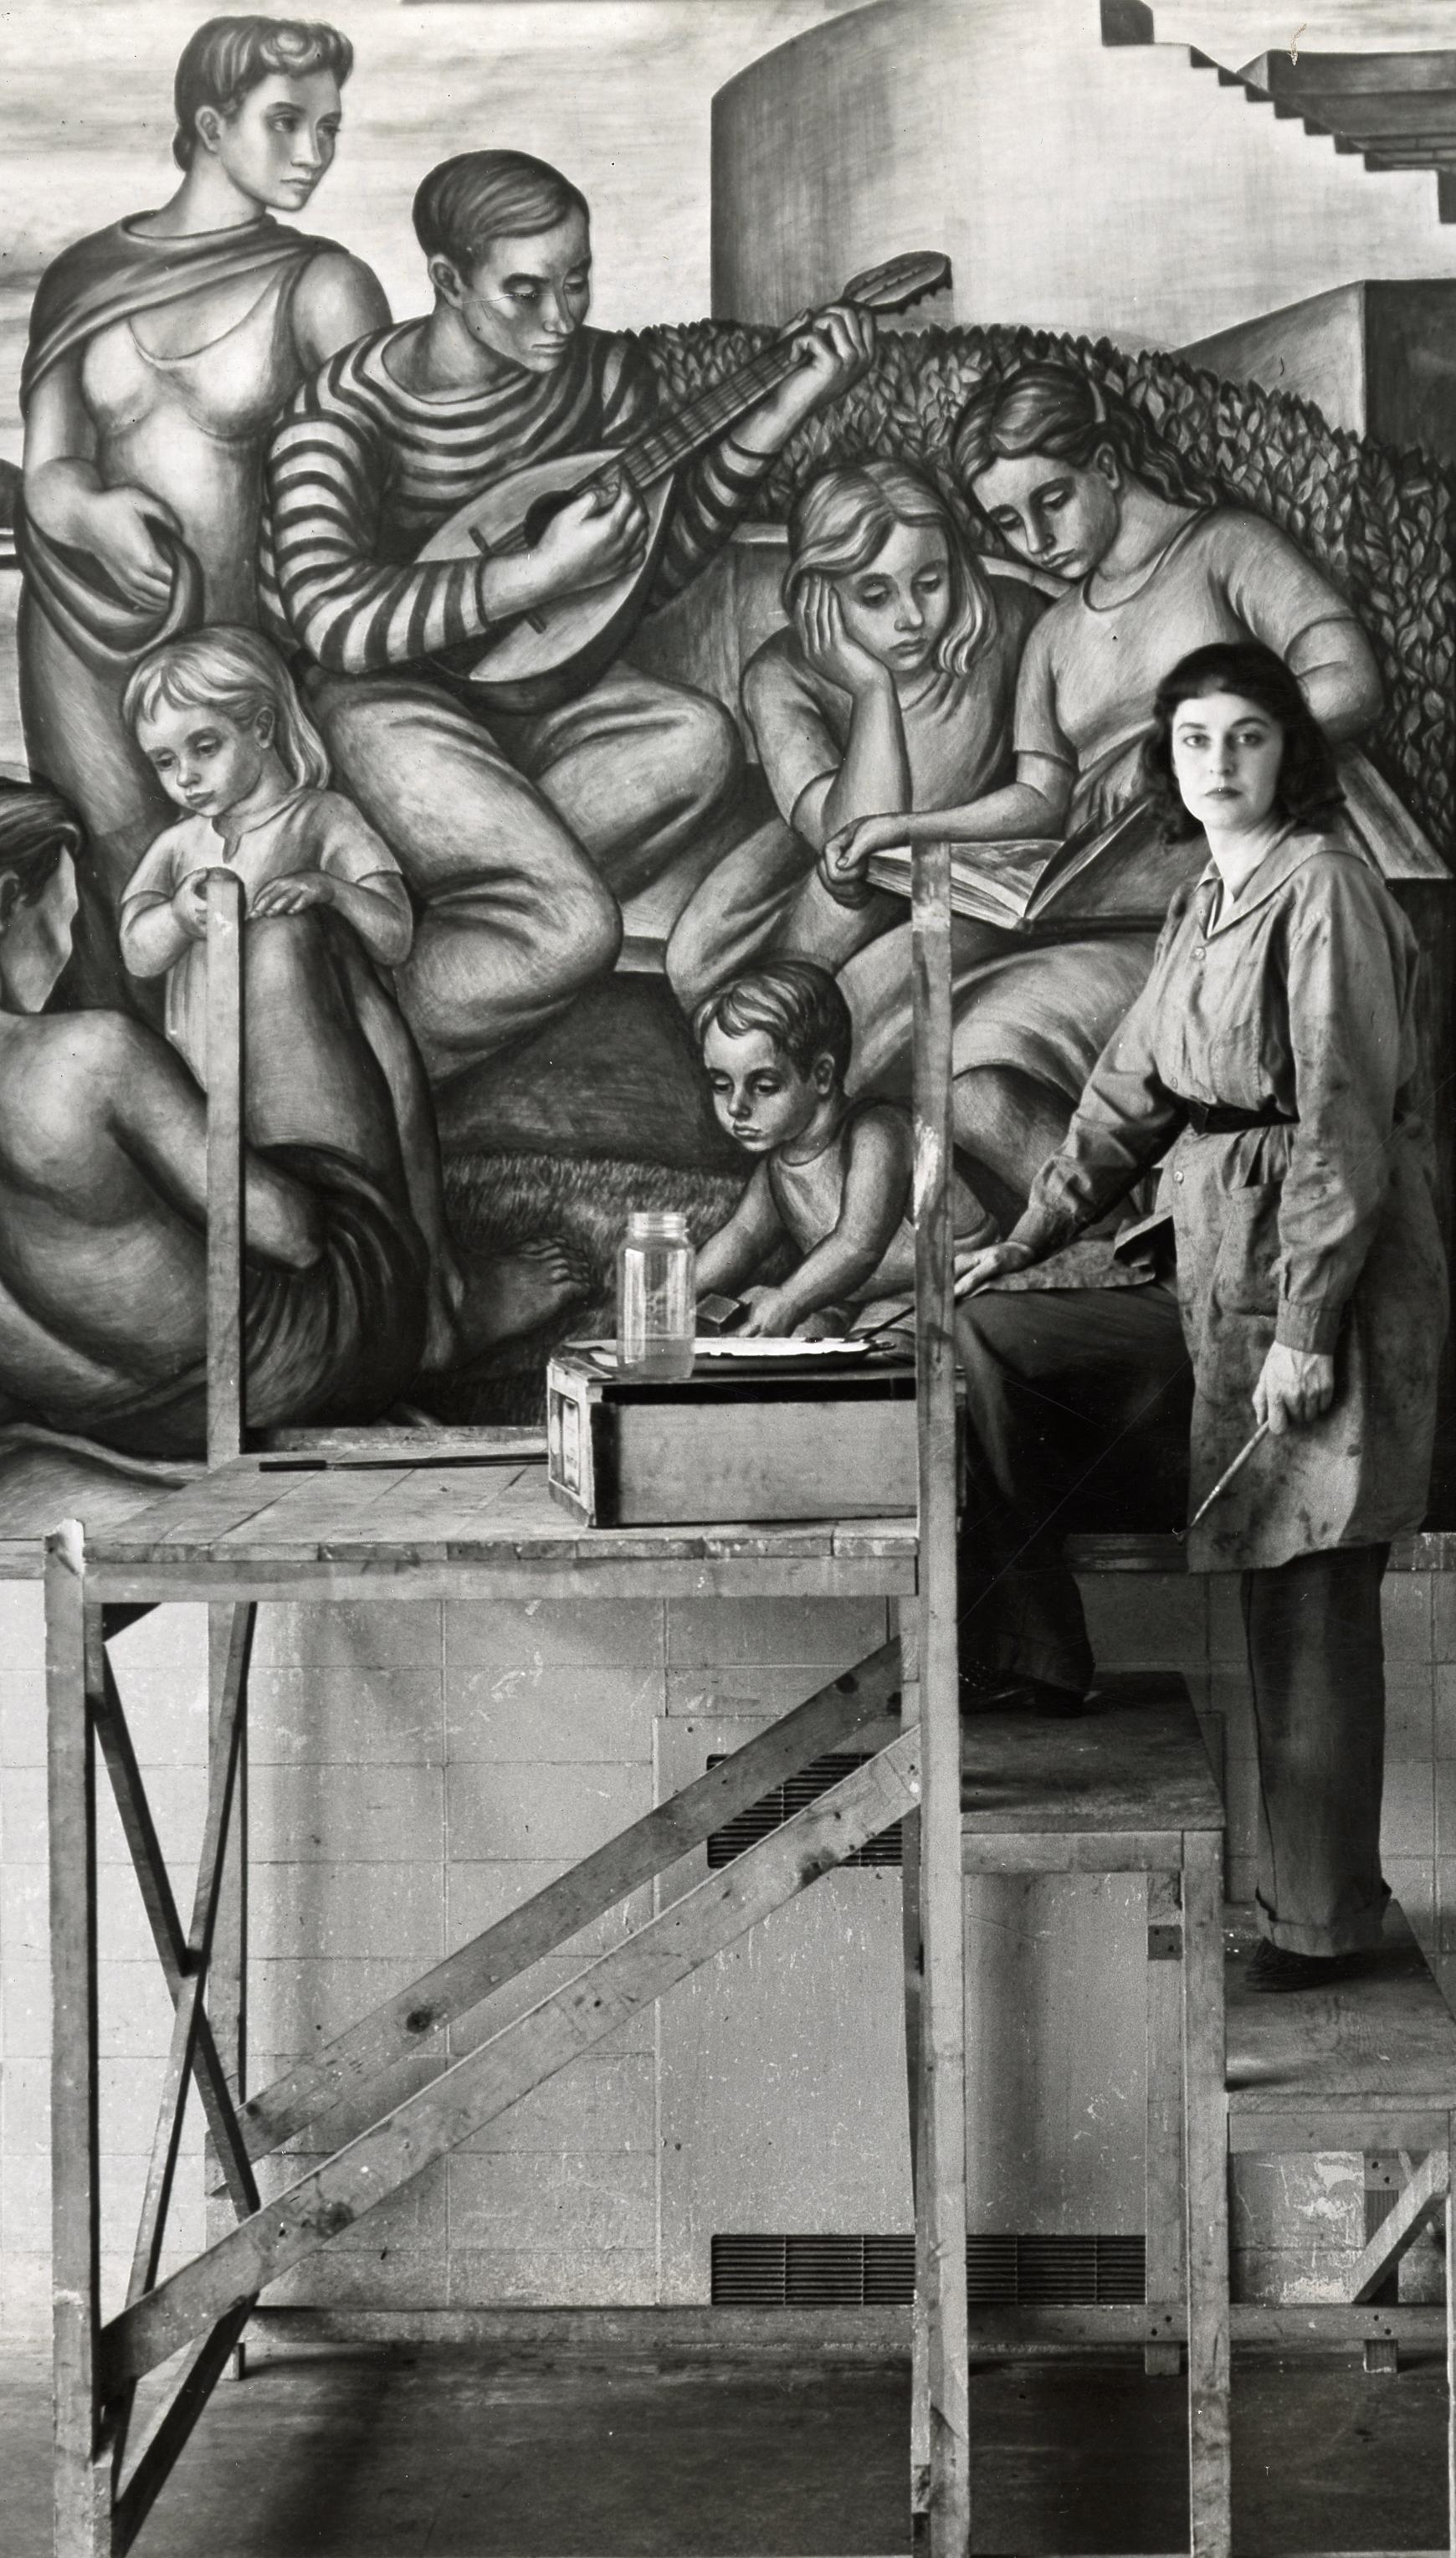 Marion Greenwood, 1940